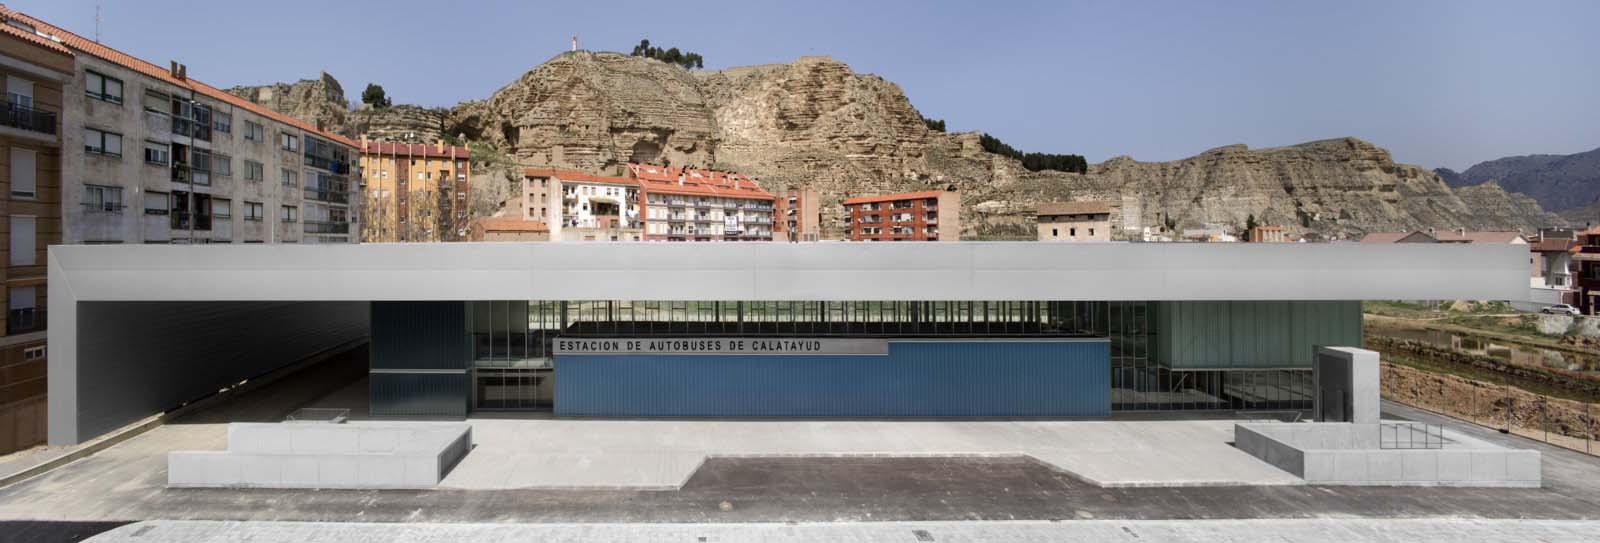 Calatayud_Bus_Station_02_Architecture_IDOM_photo_Aitor_Ortiz